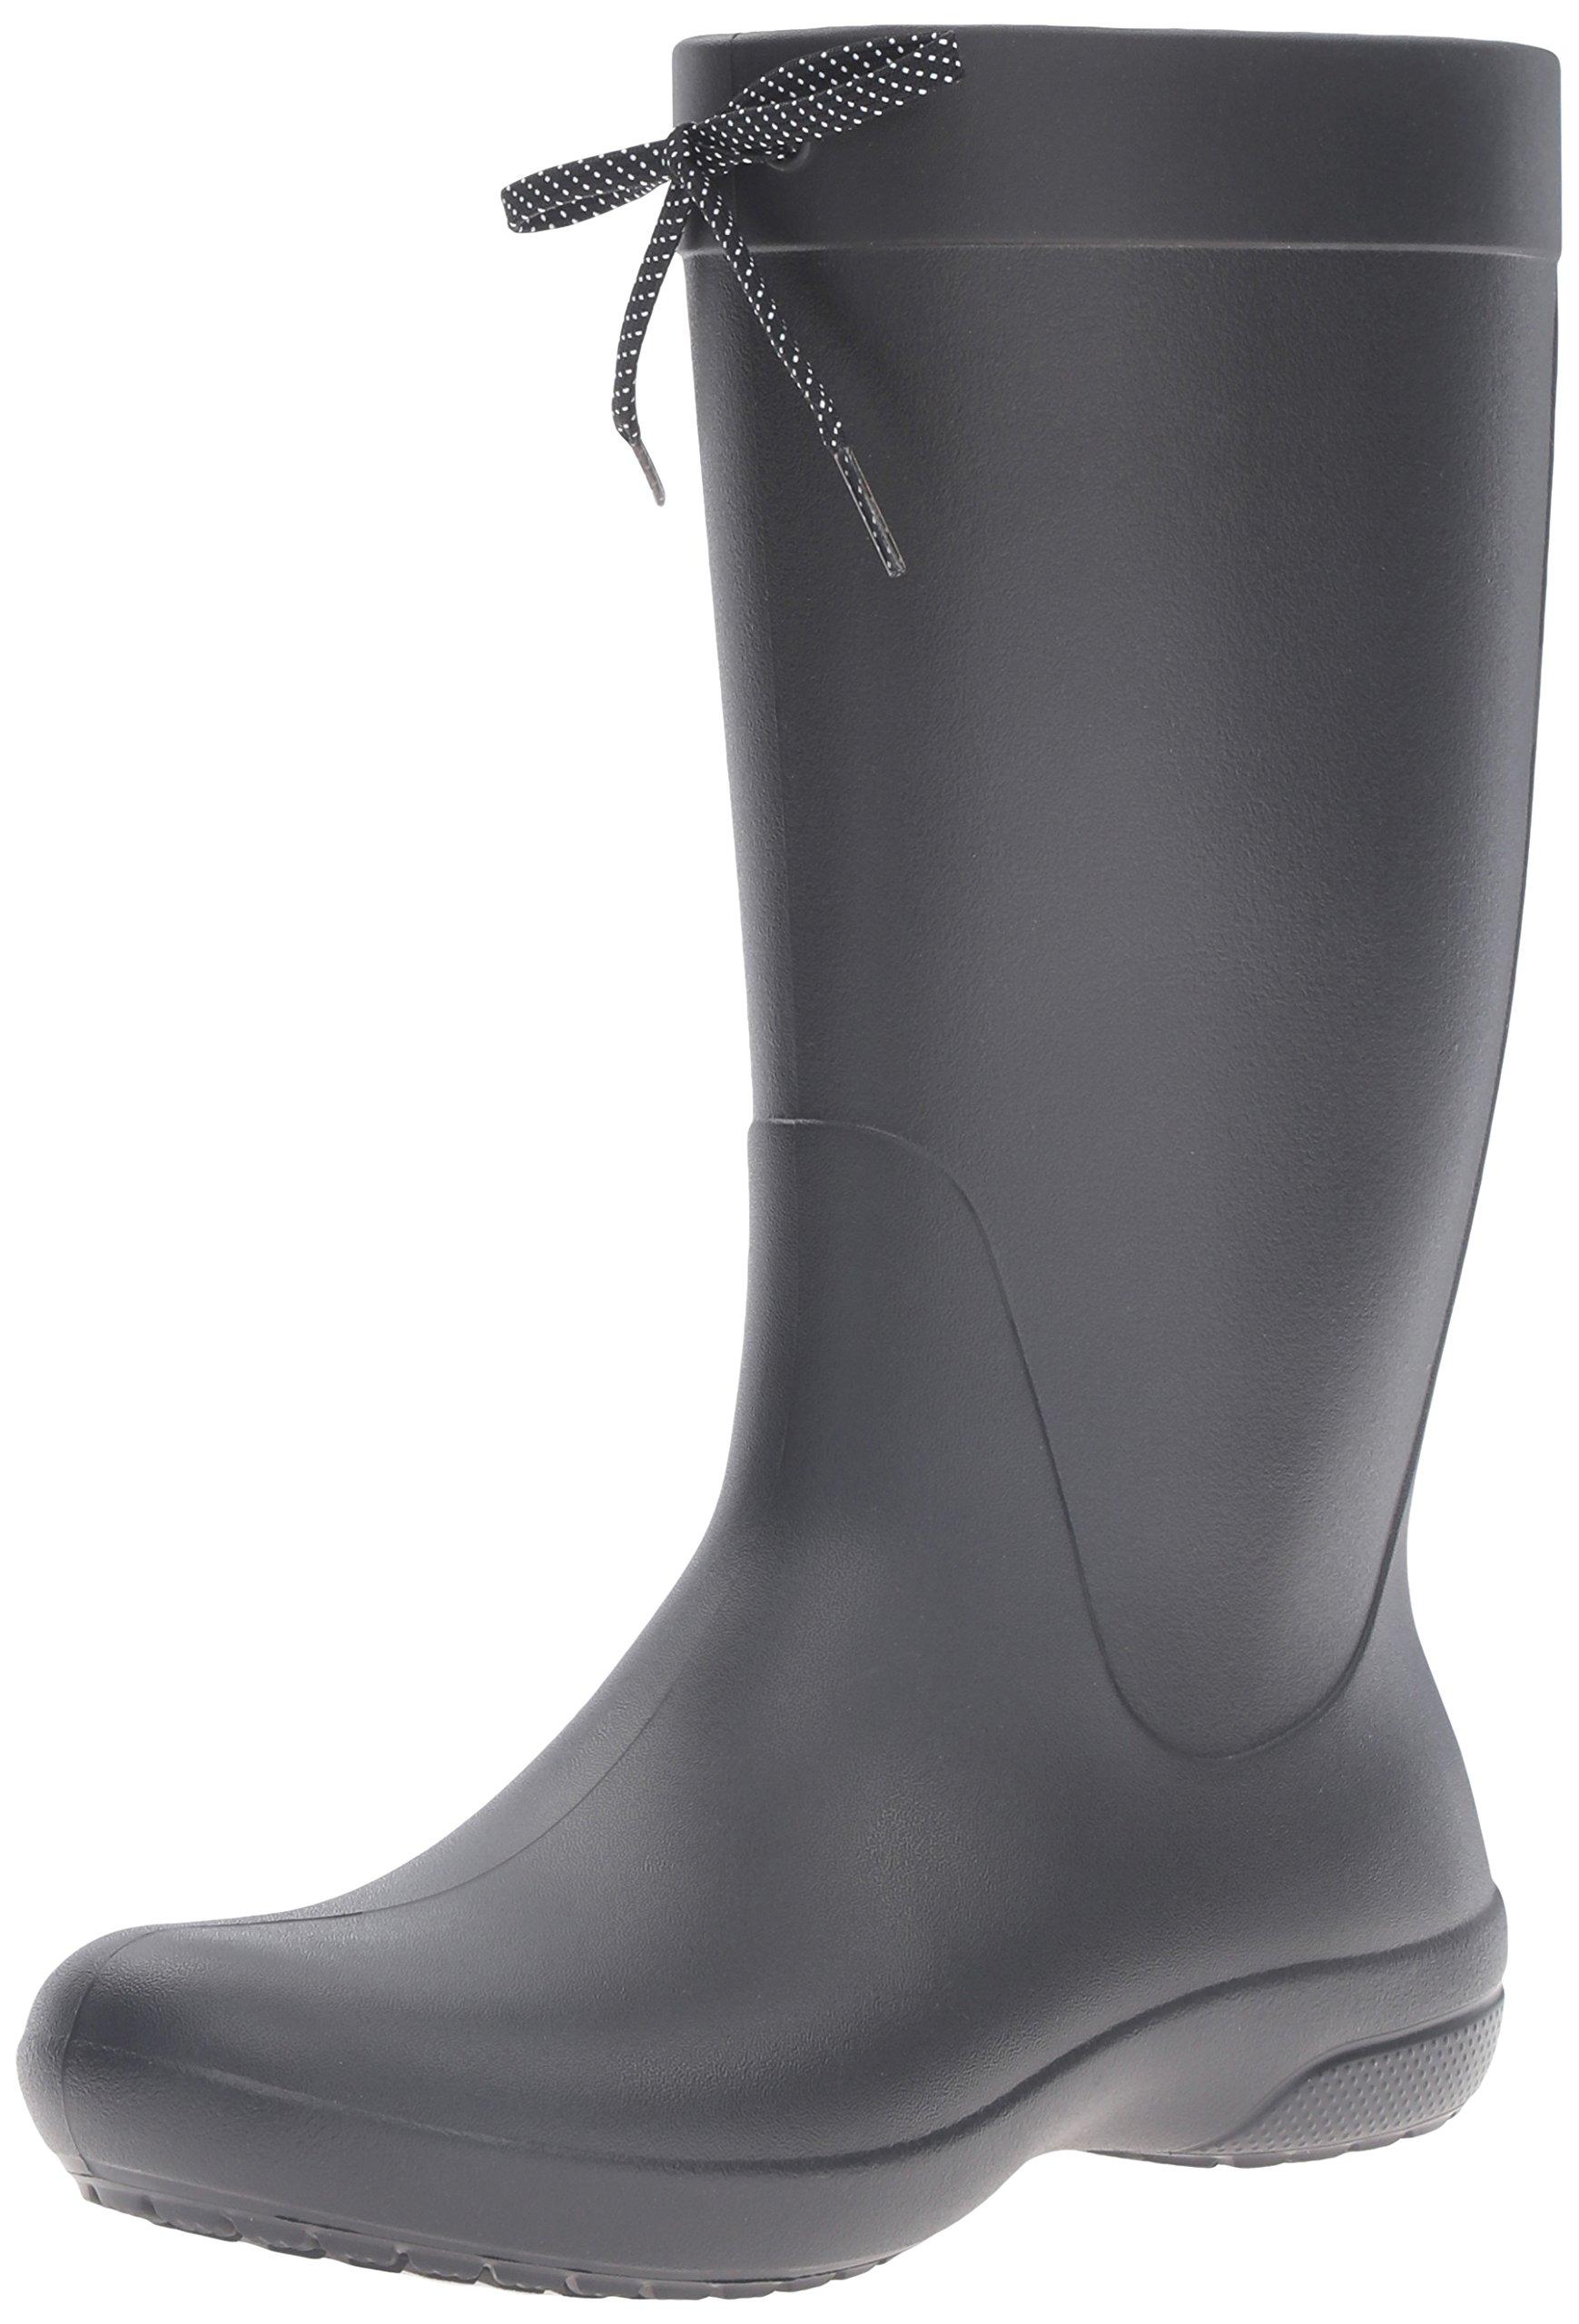 crocs Women's Freesail Rain Boot, Black, 10 M US by Crocs